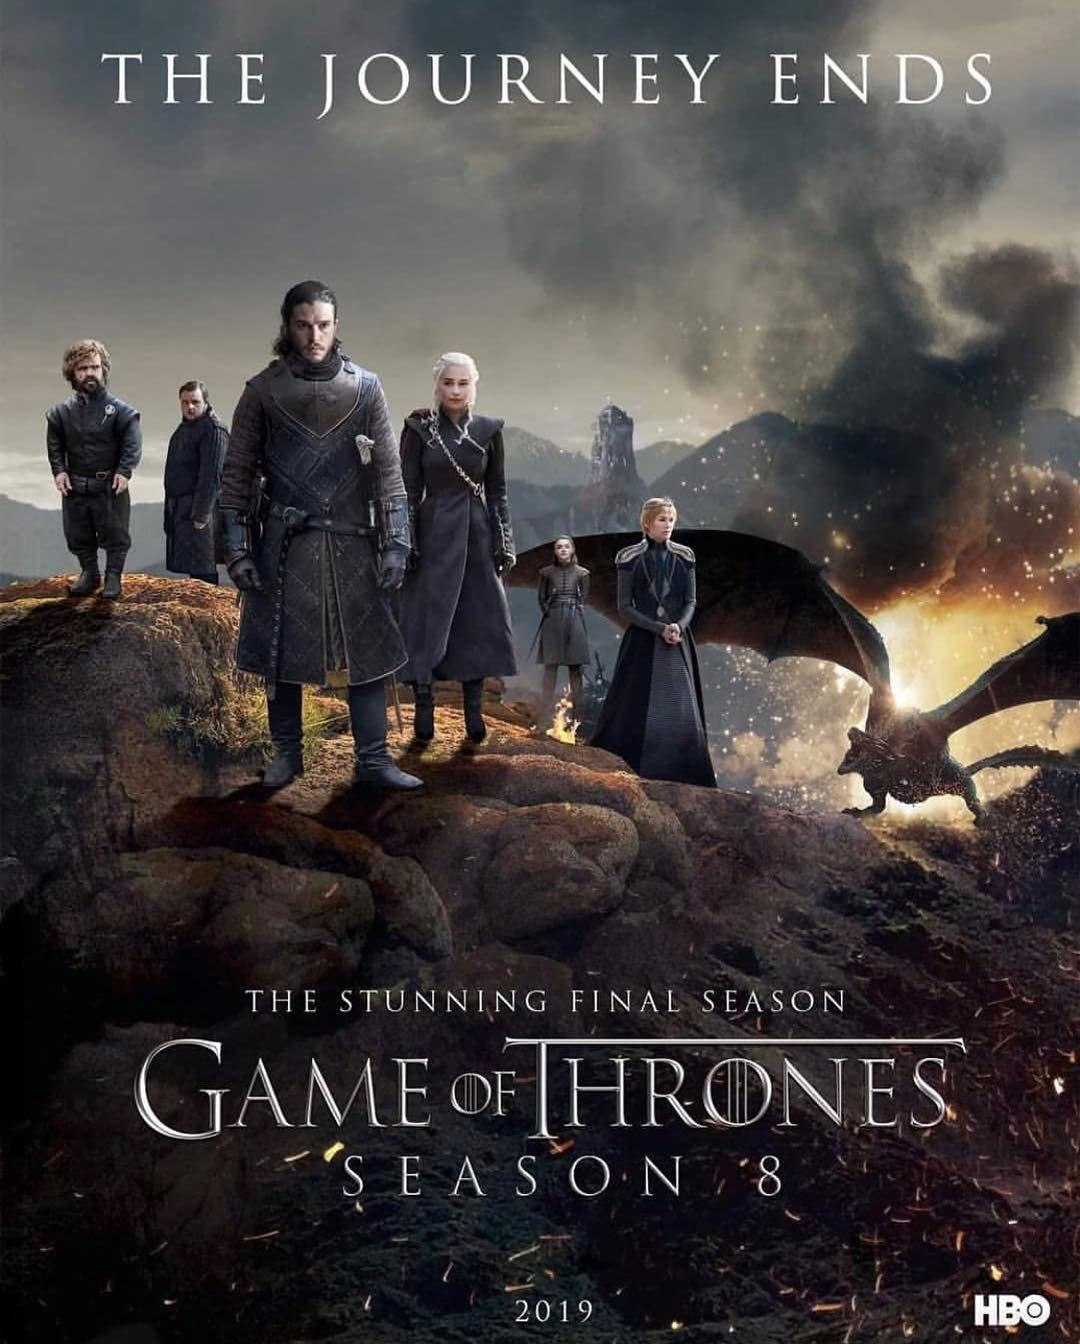 Game Of Thrones Gameofthronesnotofficial En Instagram Season 8 Fan Poster The Journey Watch Game Of Thrones Game Of Thrones Poster Game Of Thrones Online